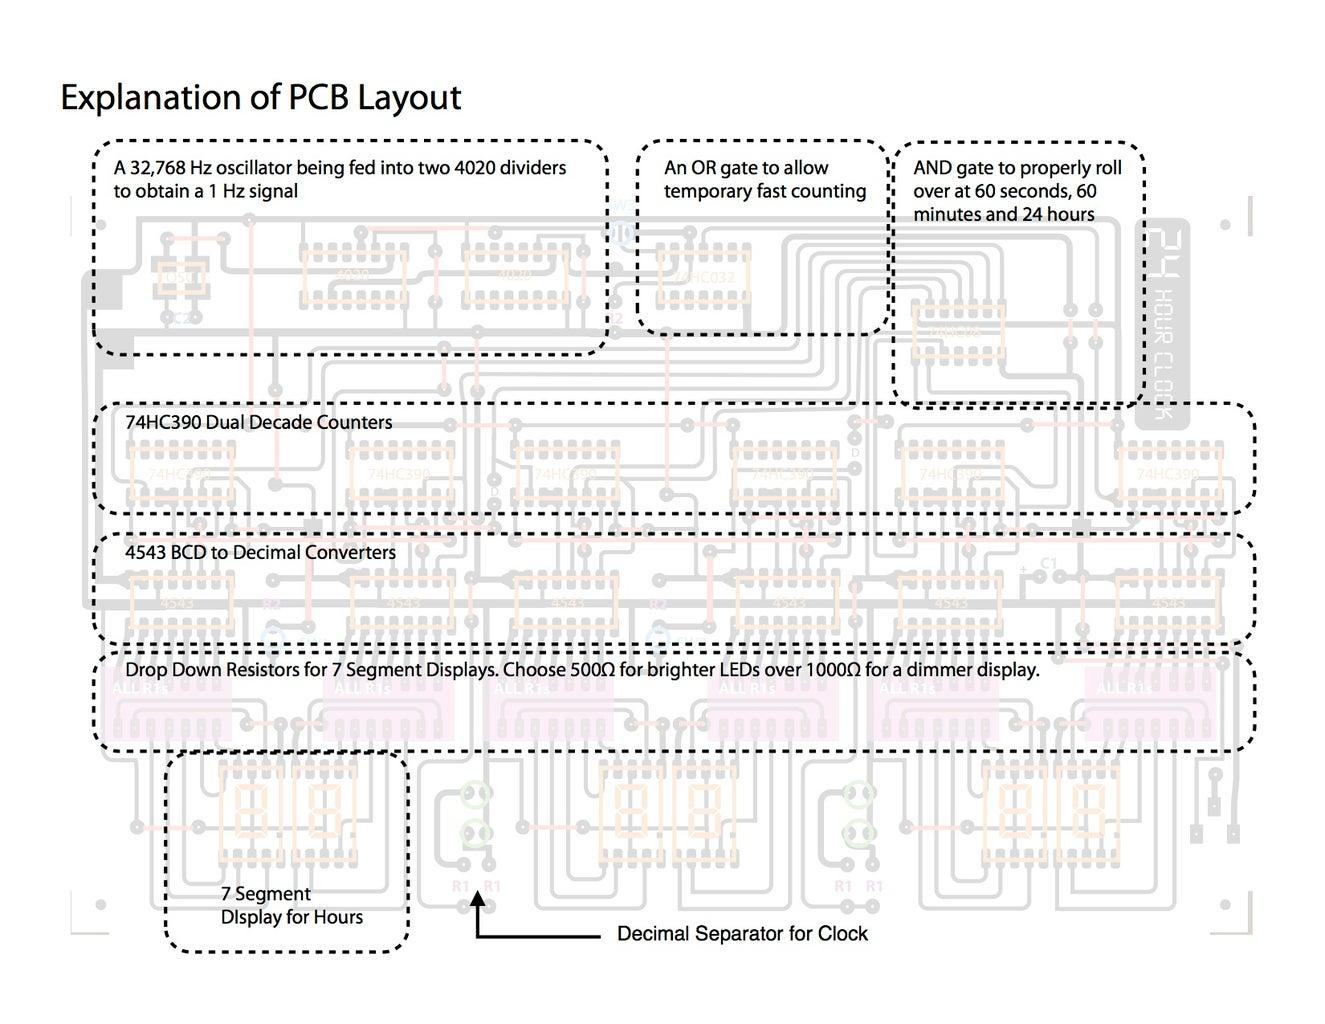 PCB Layout & Explanation